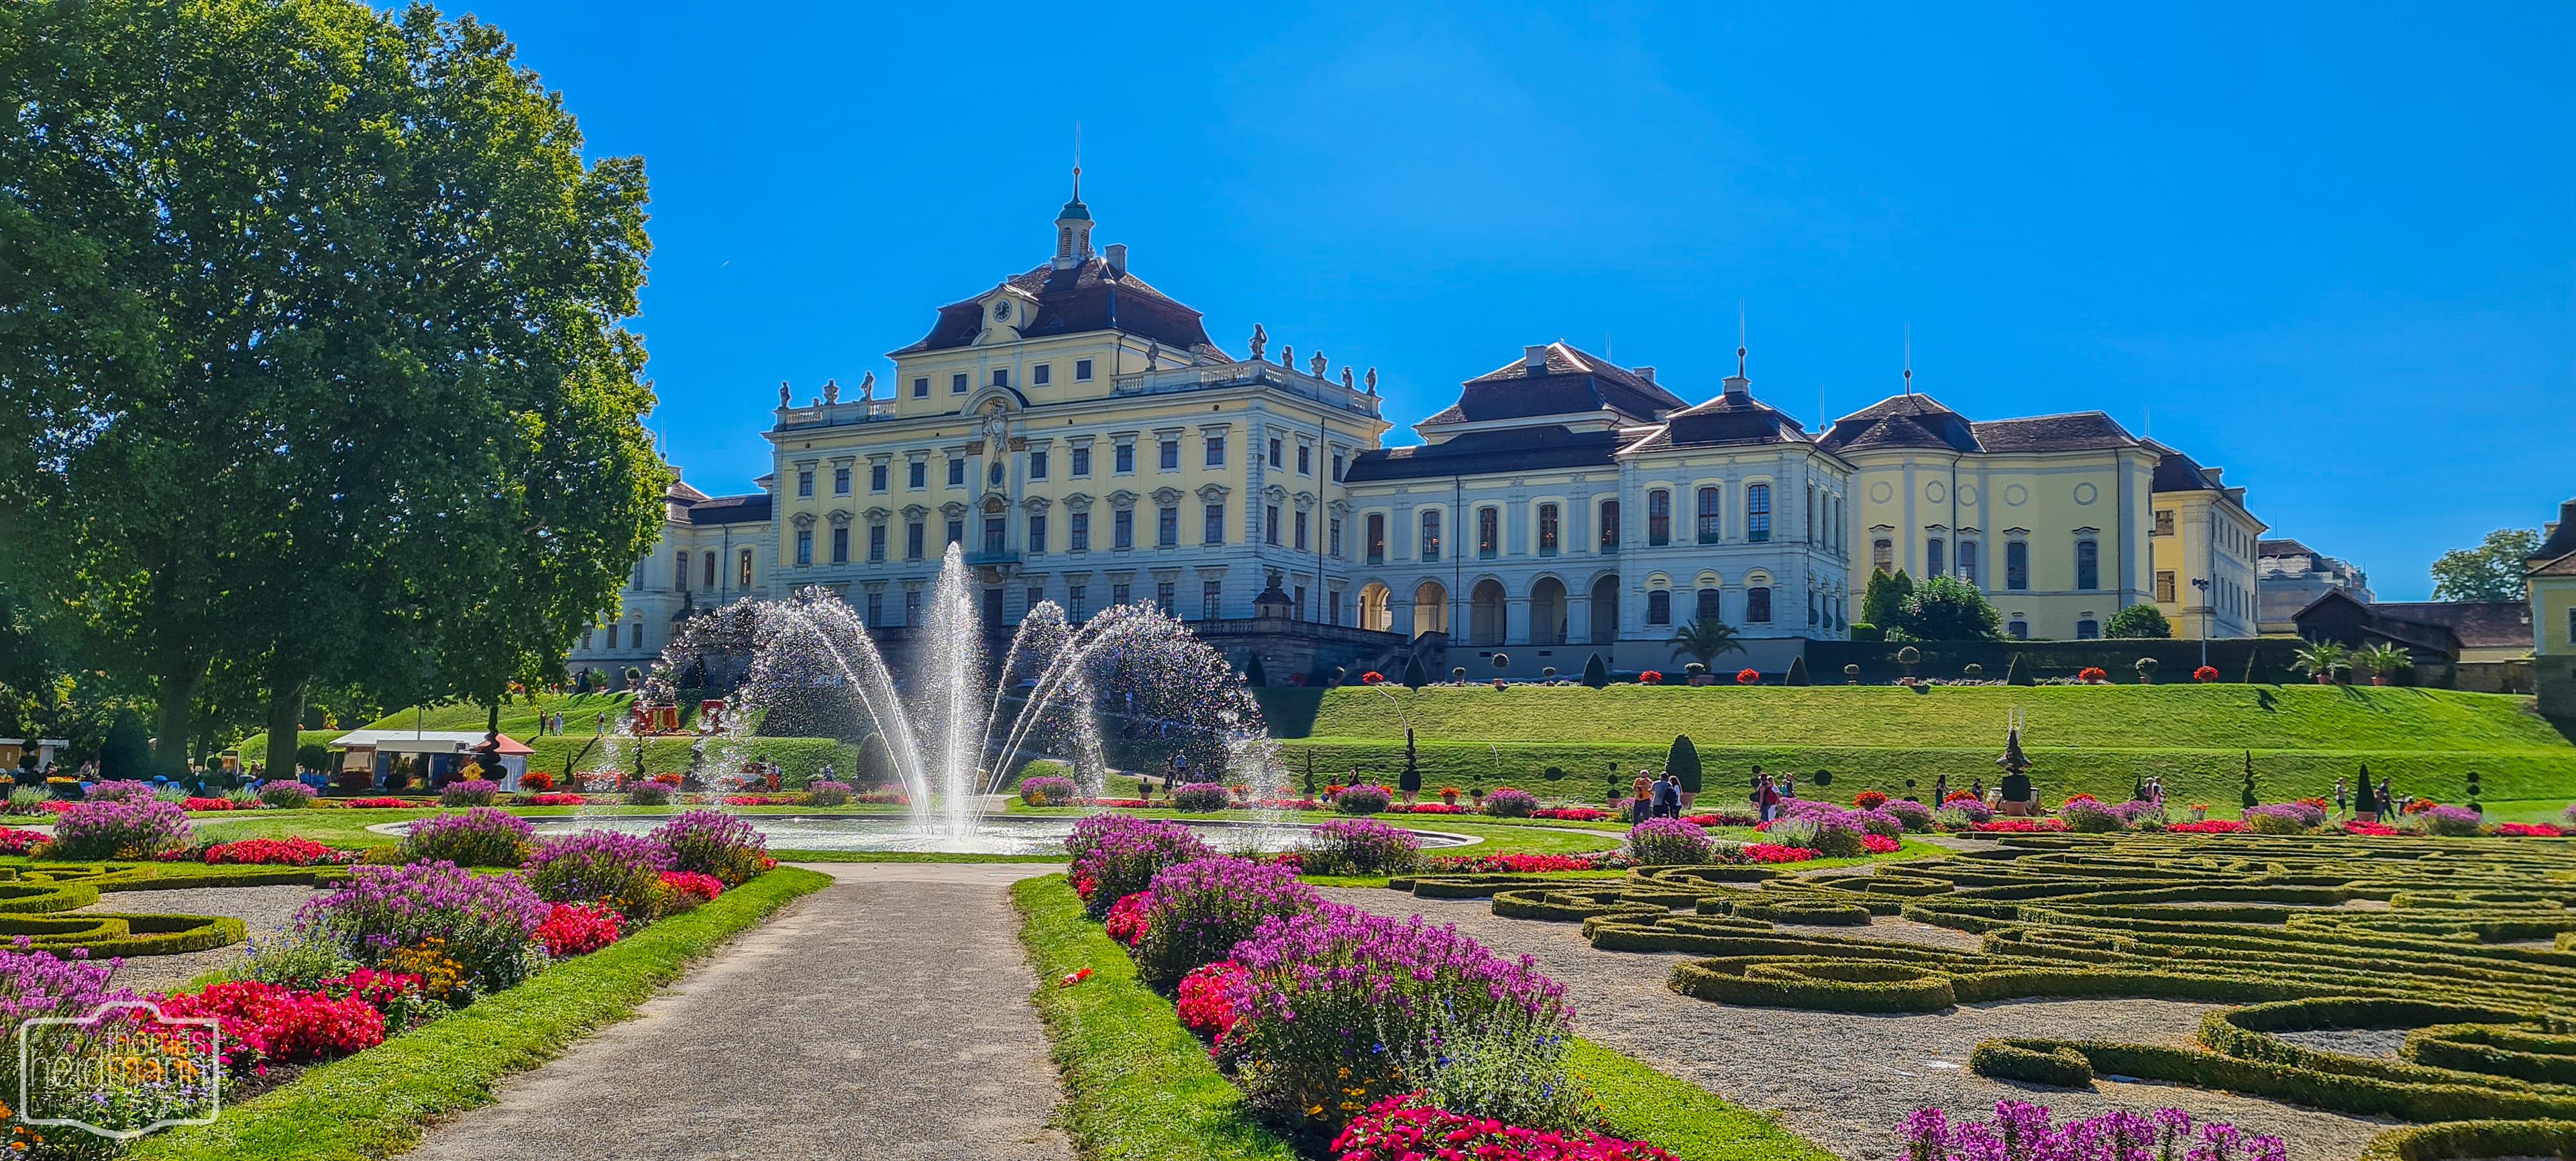 Kürbisfest am Ludwigsburger Schloss